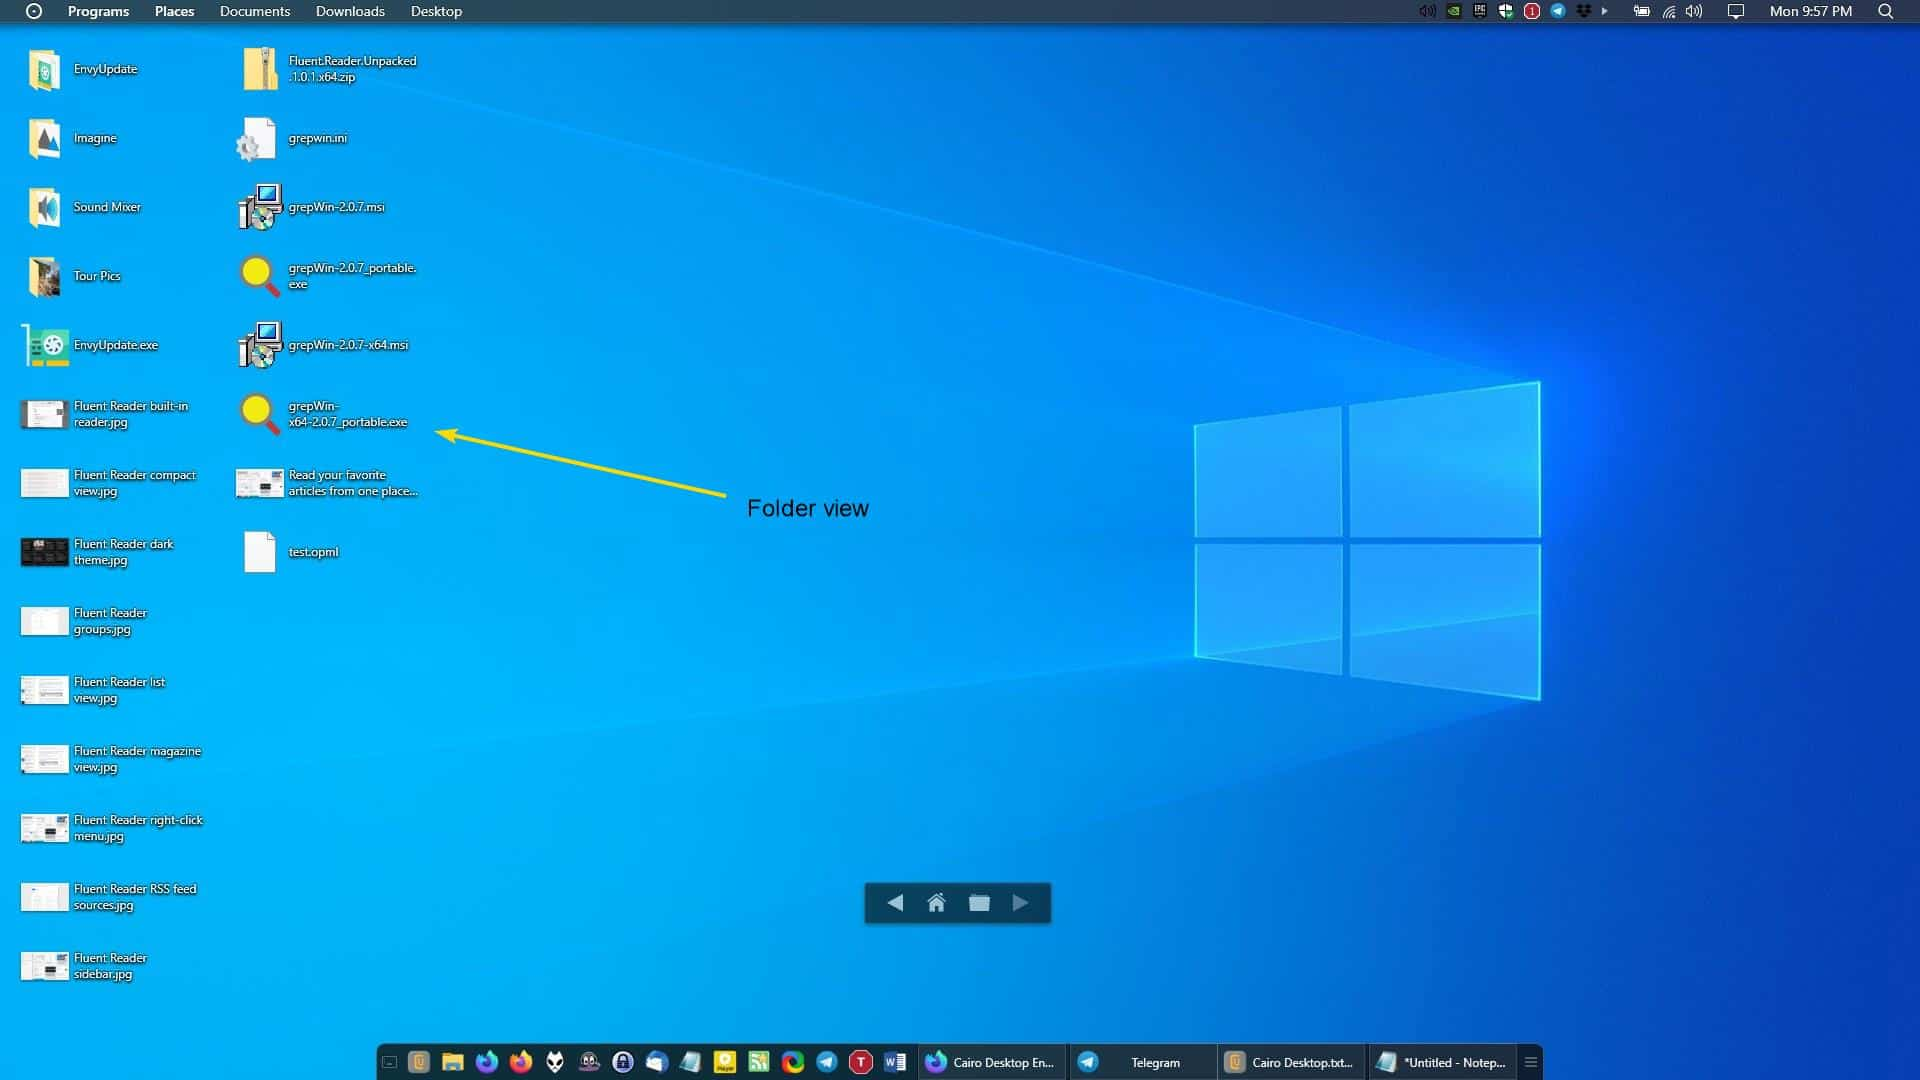 Cairo Desktop browse folders